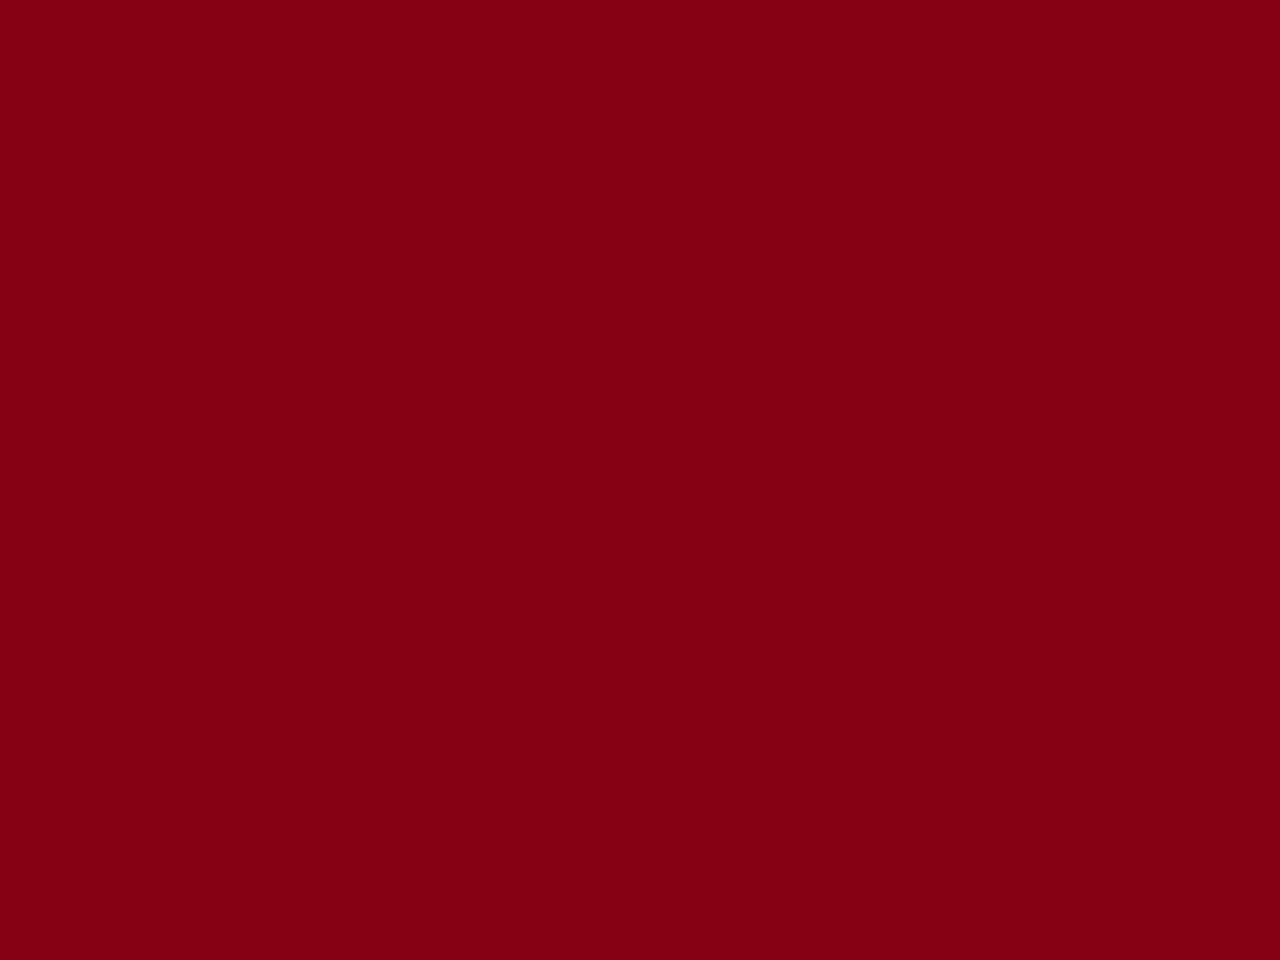 1280x960 Red Devil Solid Color Background